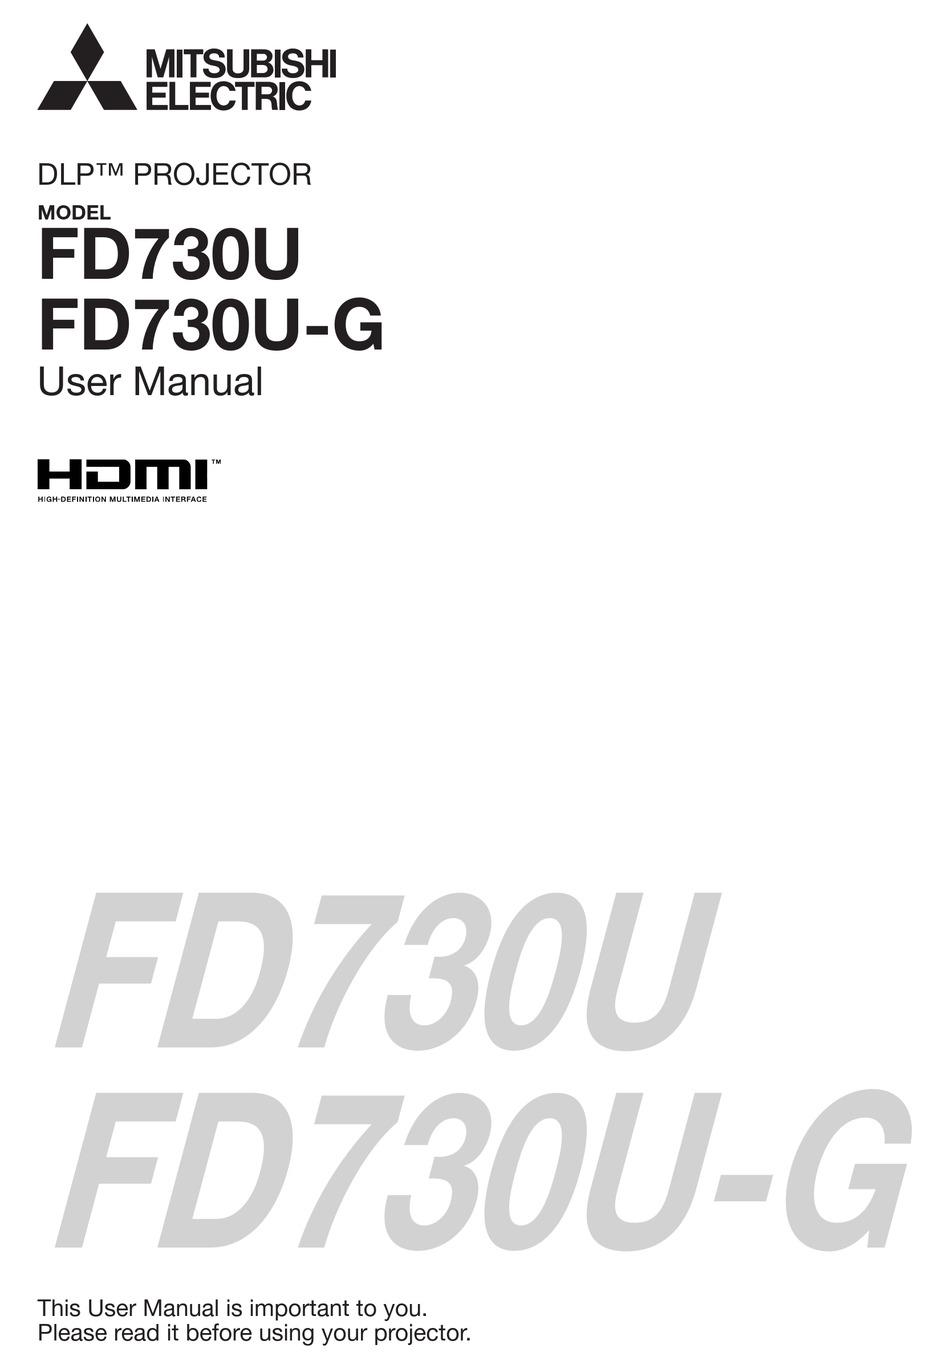 Mitsubishi Electric Dlp Fd730u User Manual Pdf Download Manualslib